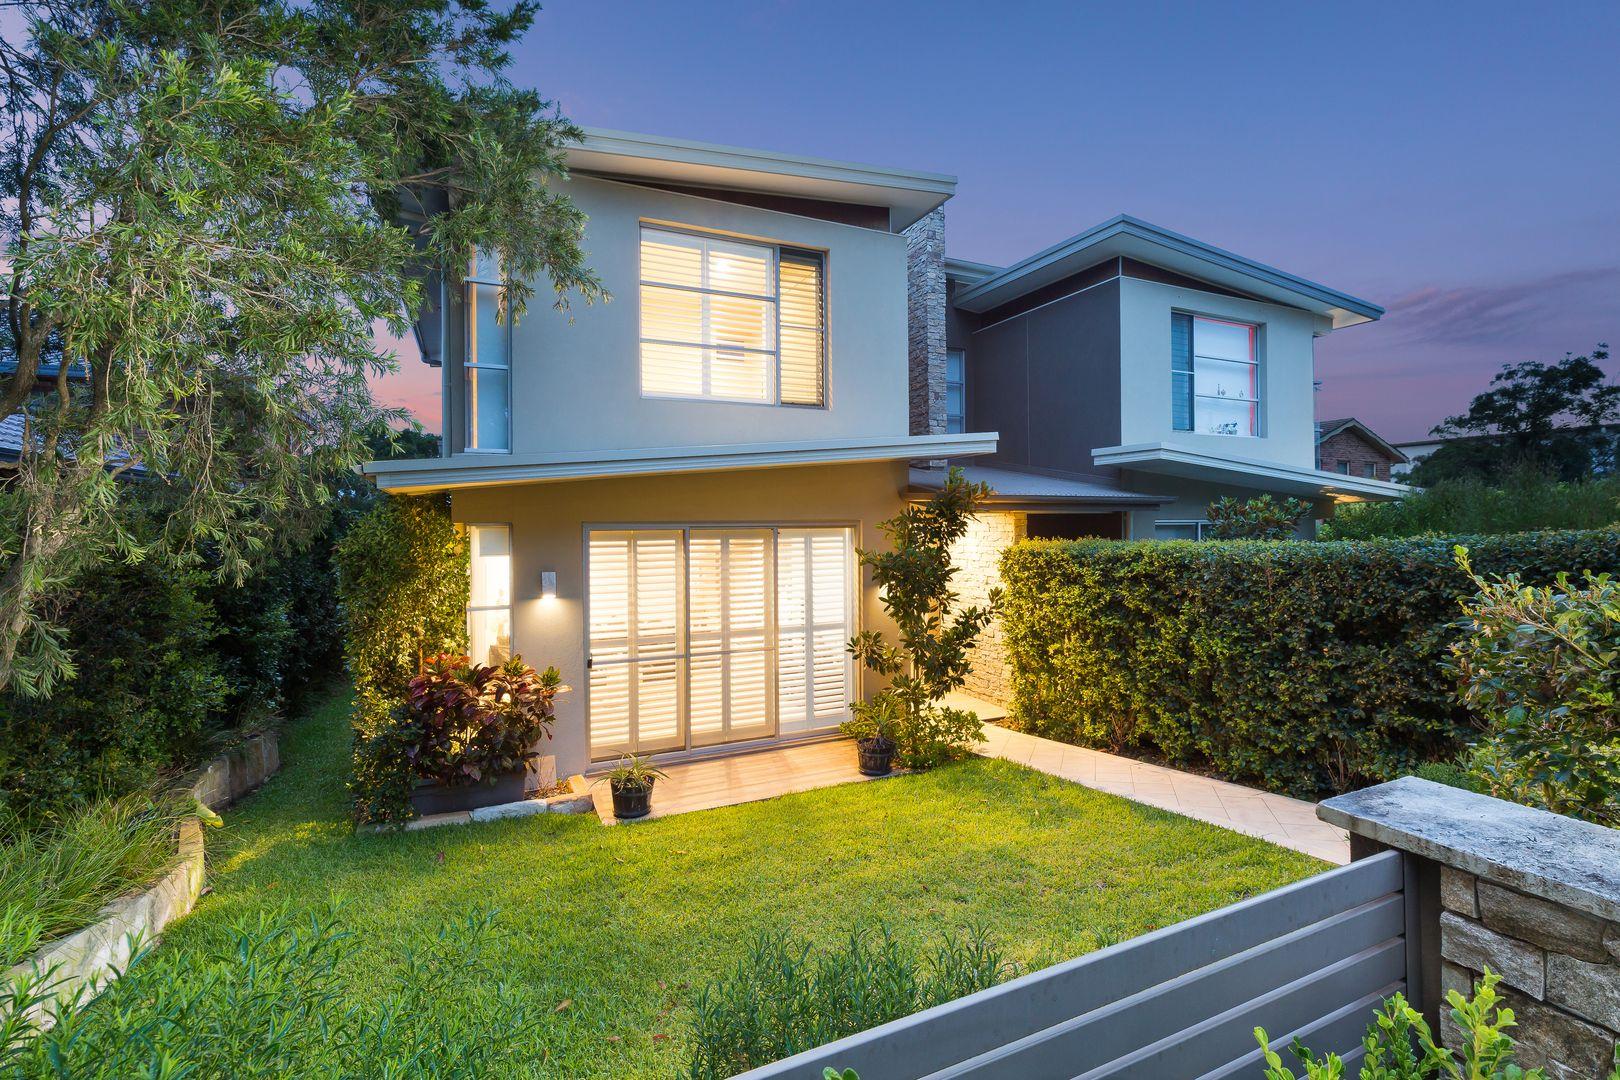 1/16 Percival Road, Caringbah South NSW 2229, Image 0